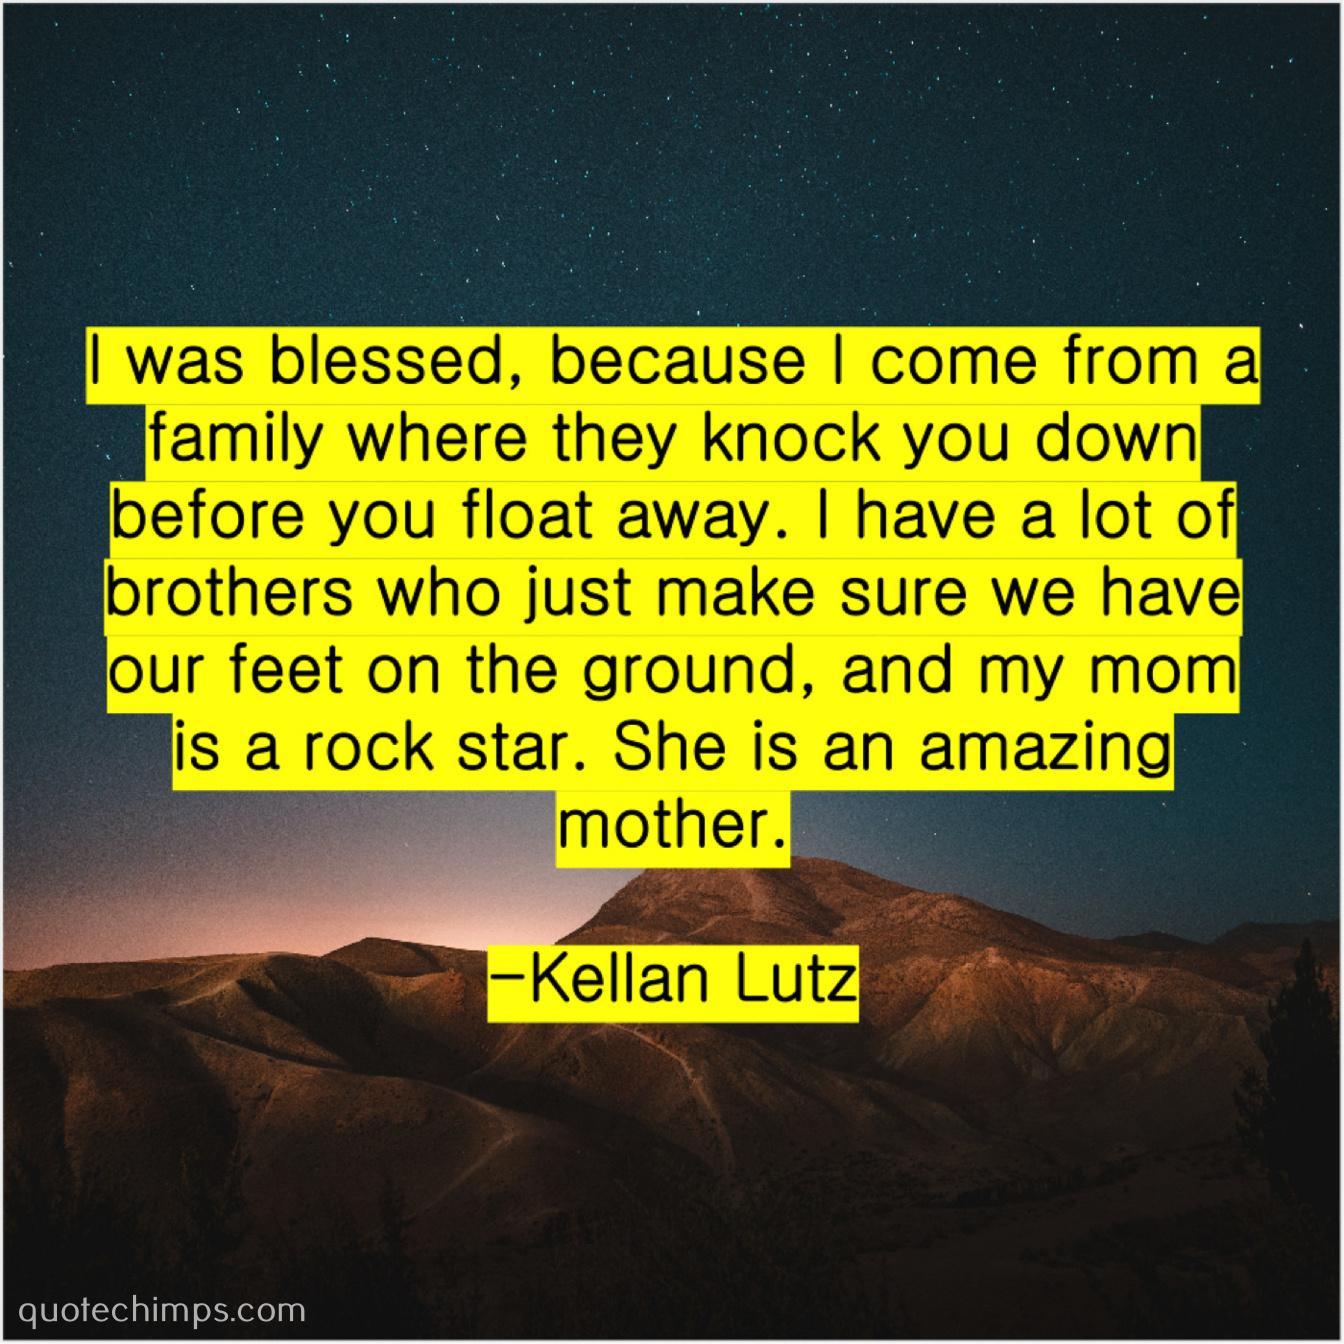 Kellan Lutz | | Quote Chimps